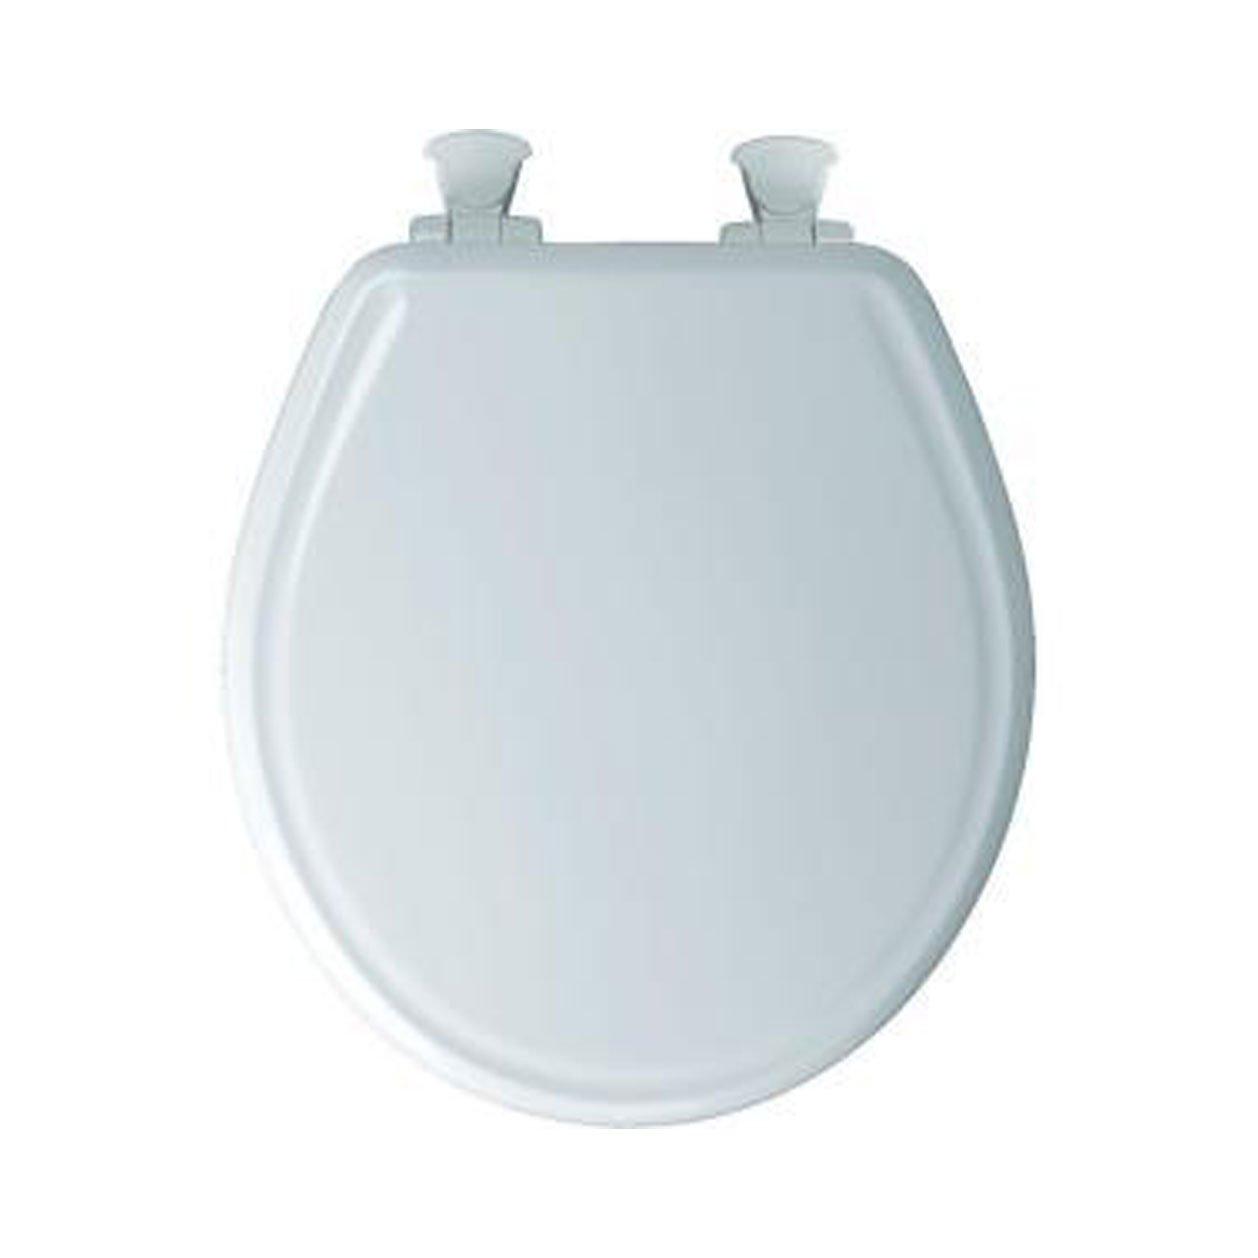 Bemis 600E3 346 Adjustable StaTite Round-front Toilet Seat with Whisper Close, Linen